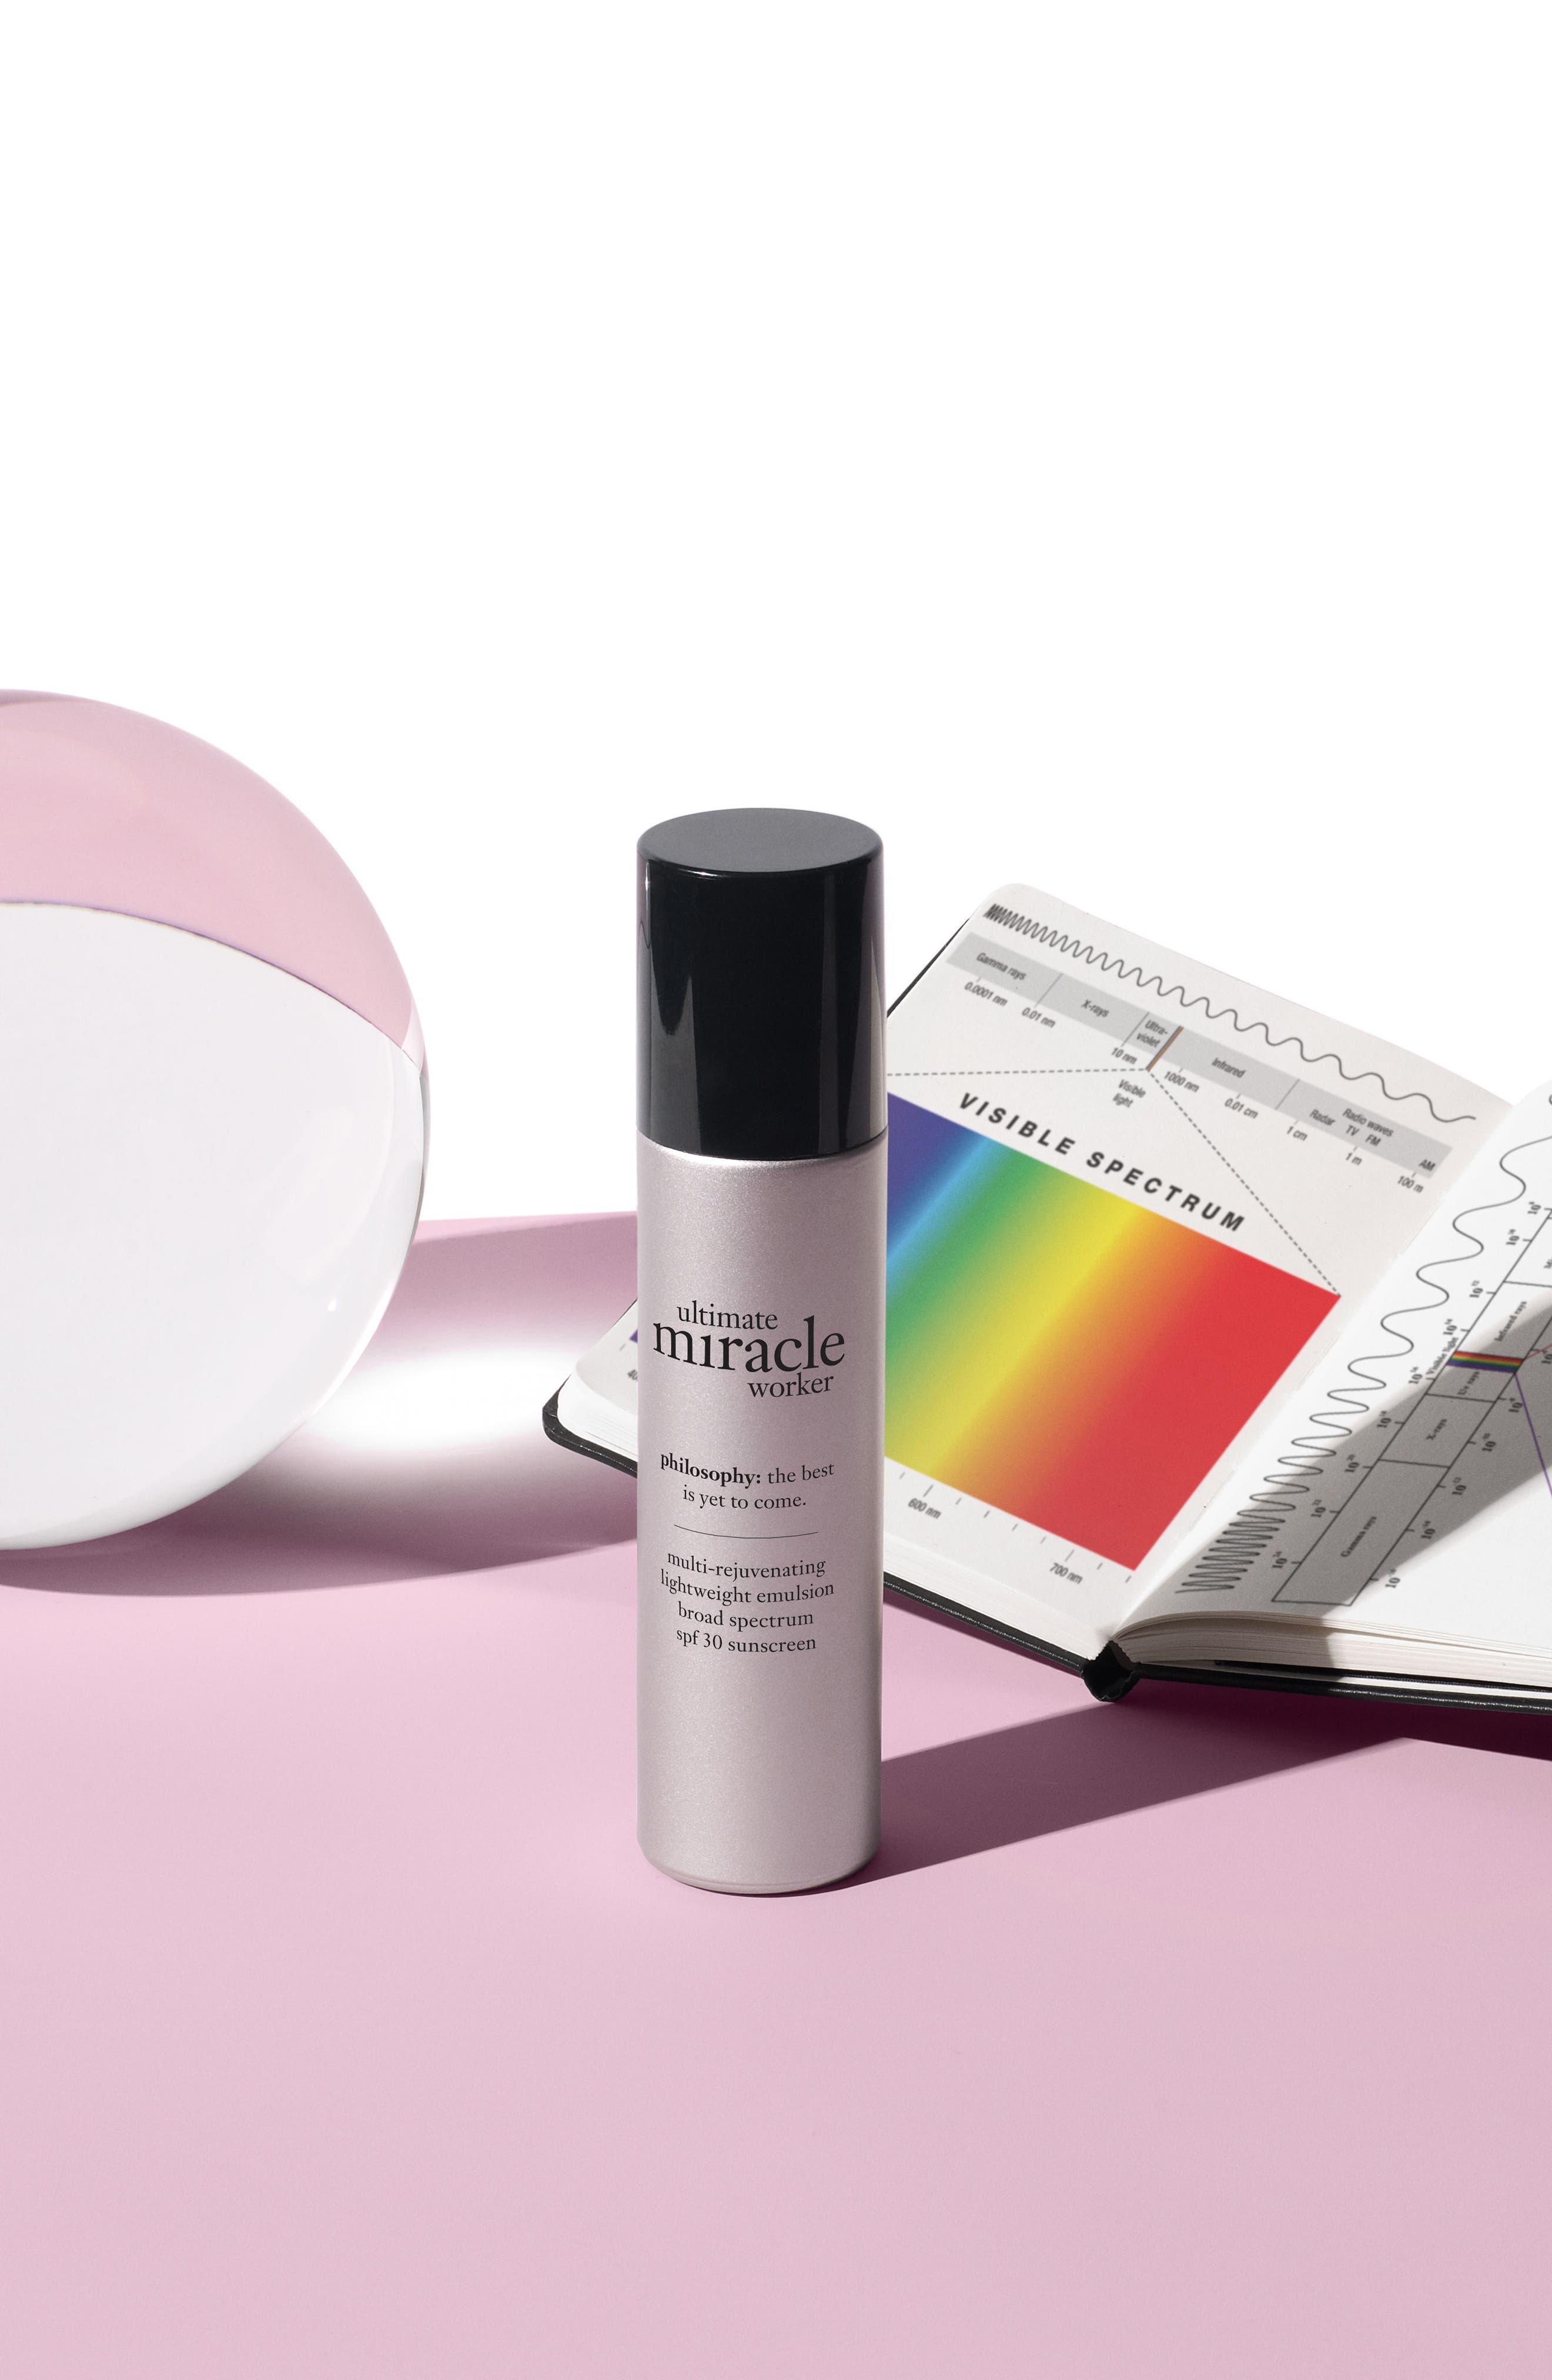 'ultimate miracle worker' multi-rejuvenating lightweight emulsion broad spectrum SPF 30 sunscreen,                             Alternate thumbnail 2, color,                             No Color